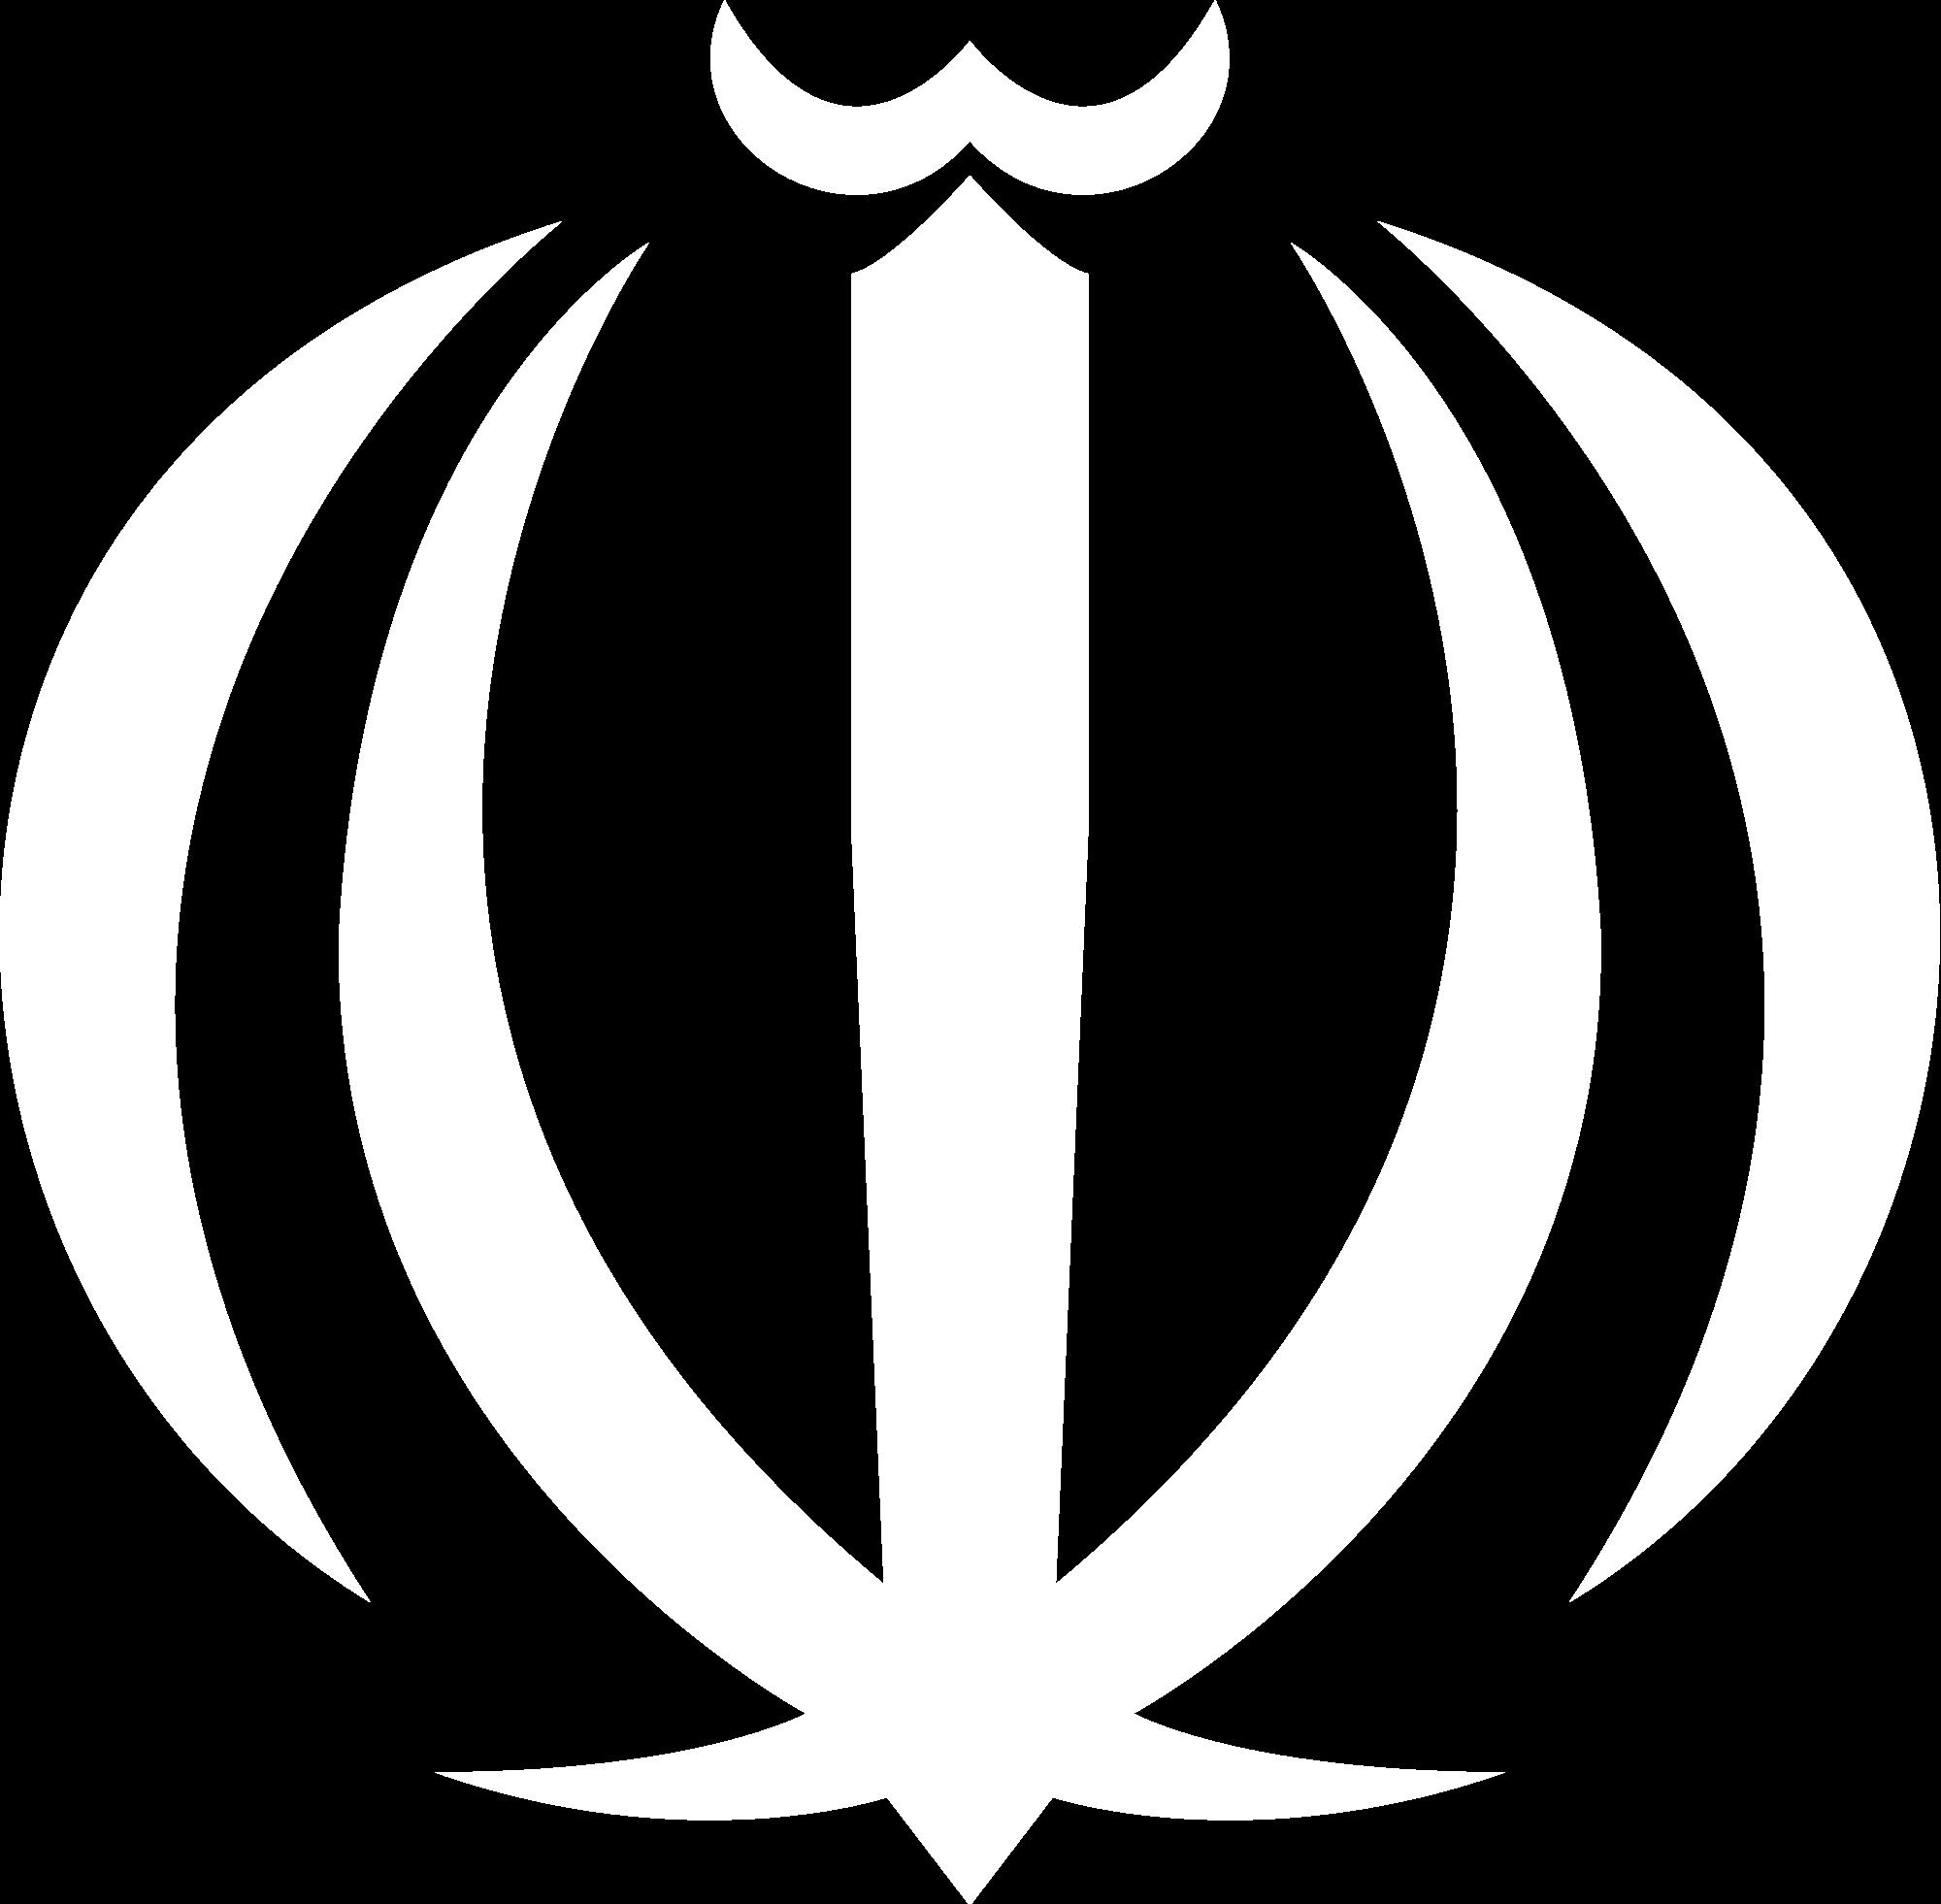 Image emblem of iran. Youtube clipart battlefield